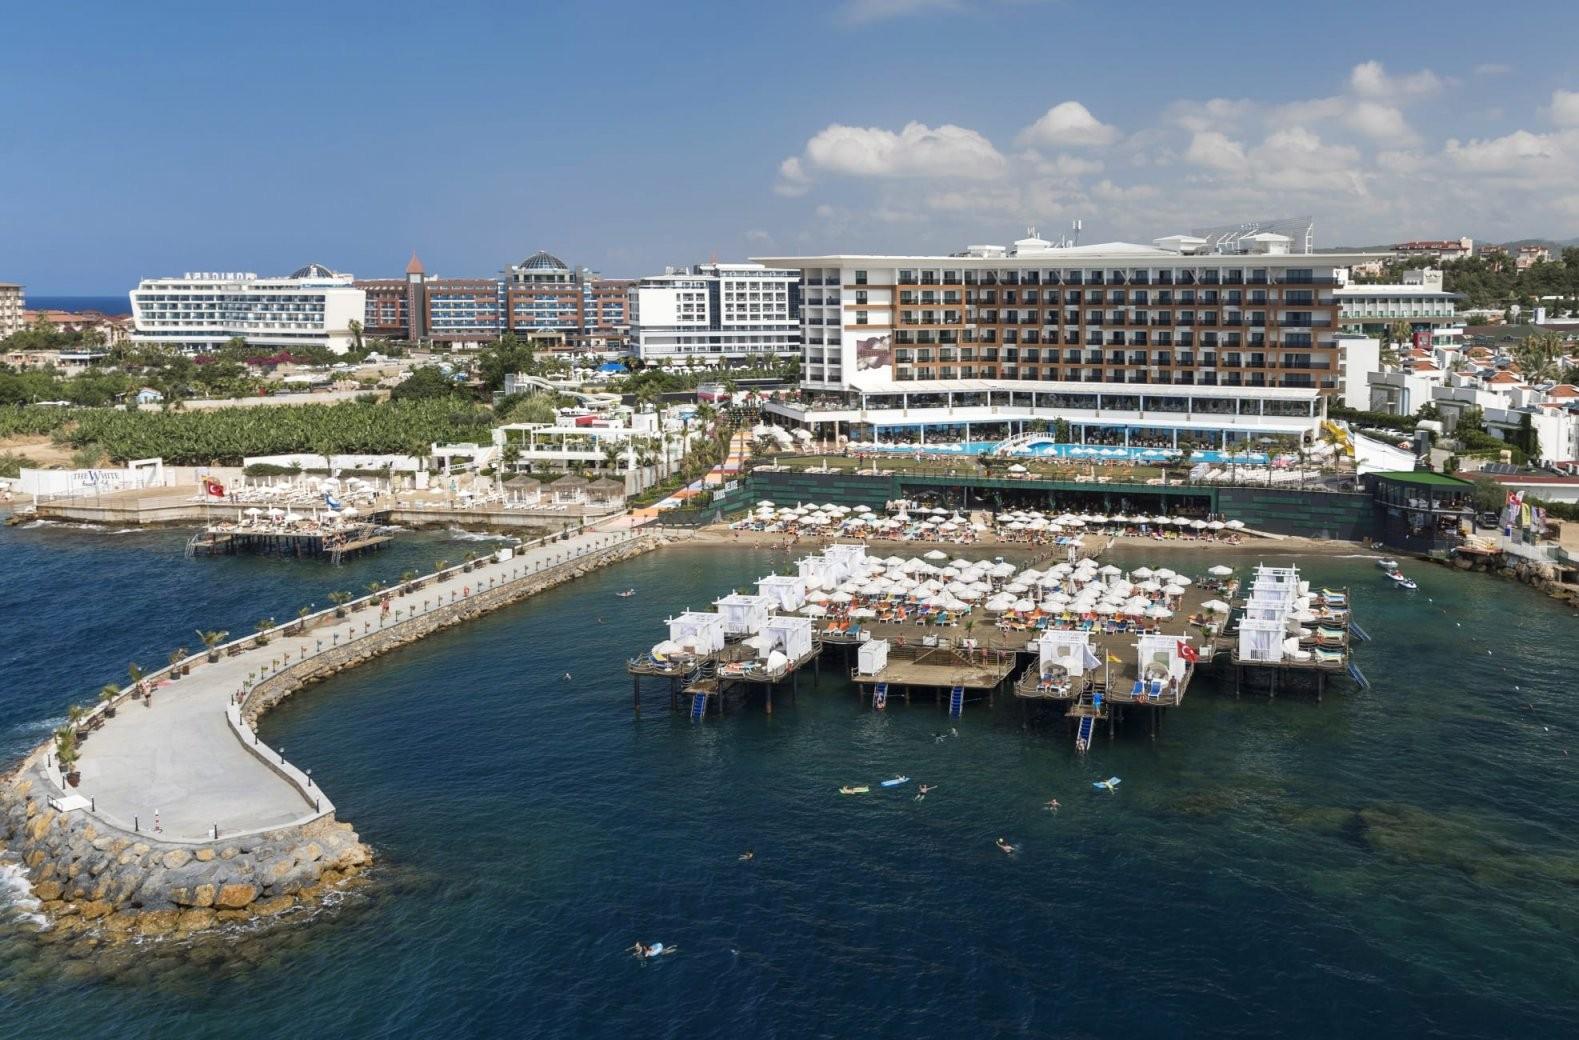 Hotel Hotel Sirius Deluxe Avsallar  Trivago von Vikingen Infinity Resort & Spa Bewertung Bild